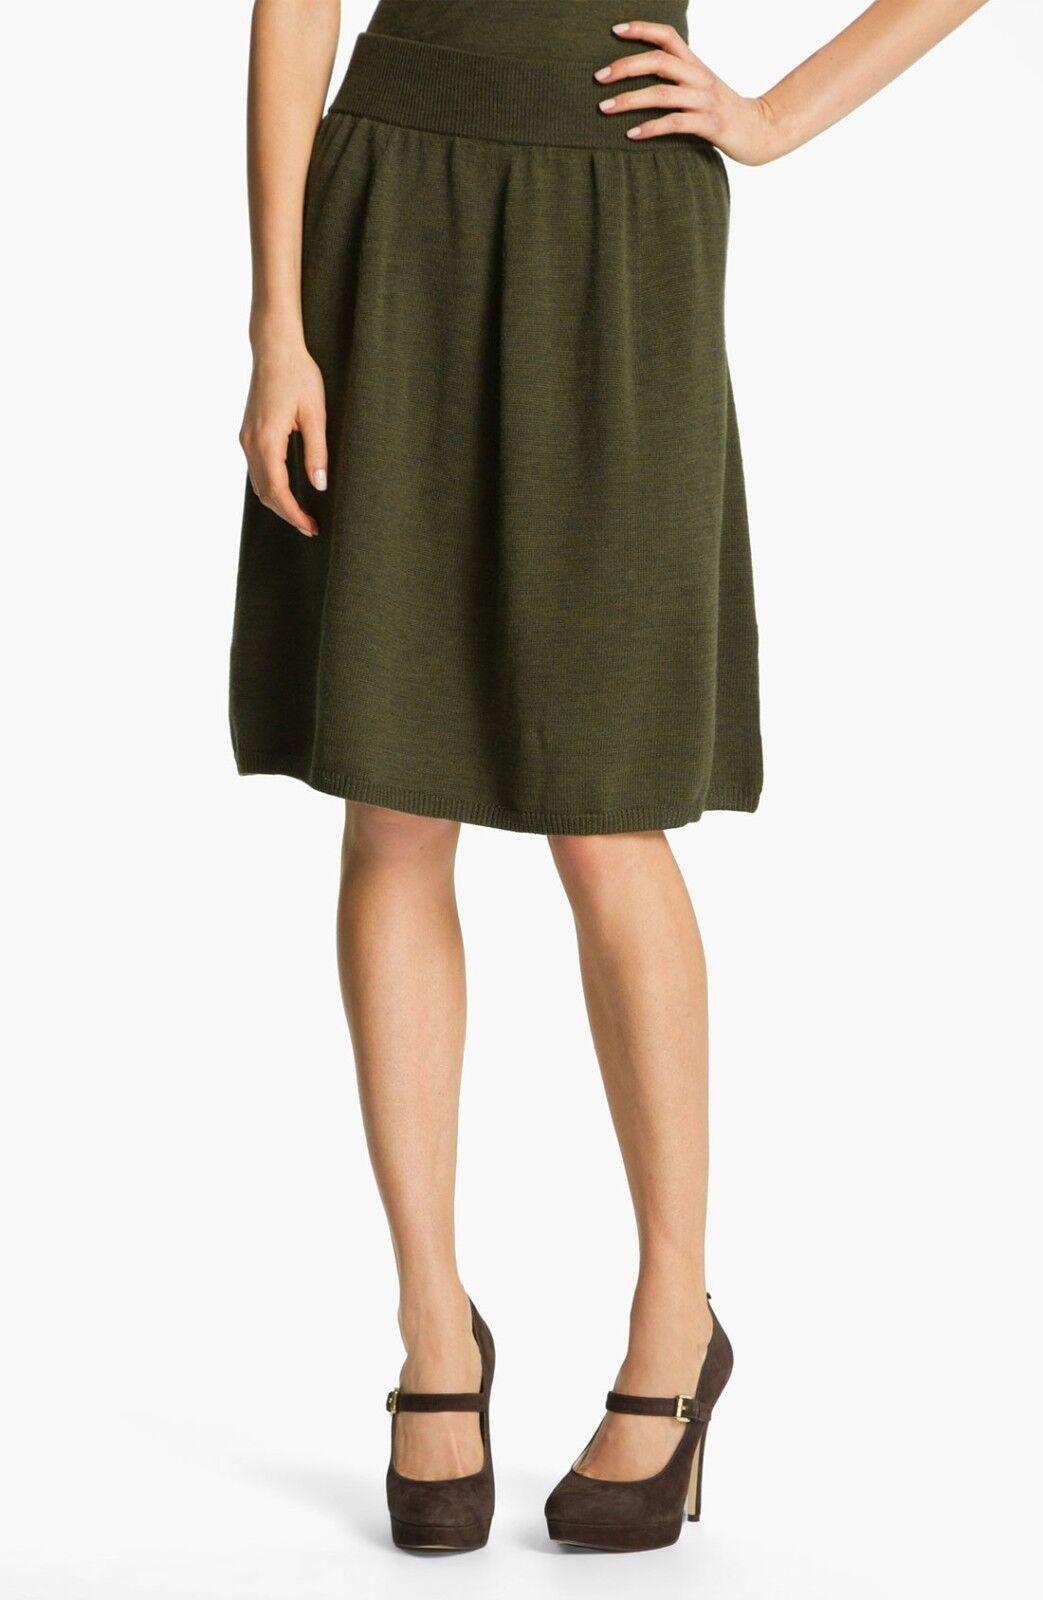 198 Eileen Fisher Fine Merino Wool Cyprus A-Line Knee Length Skirt L